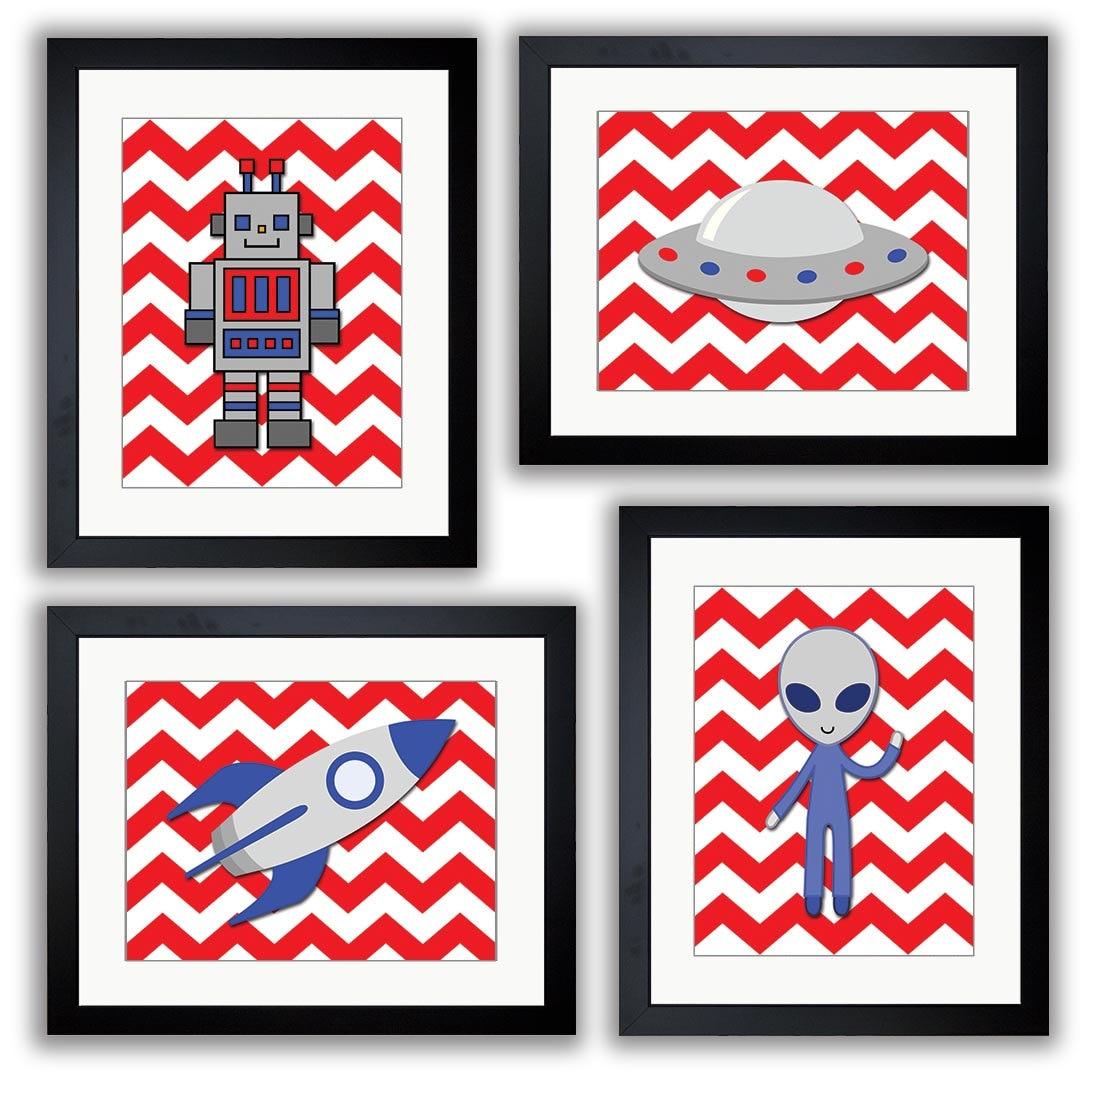 Red Space Art Child Art Prints Set of 4 Alien Spaceship Rocket and Robot Boy Kids Room Wall Art Deco